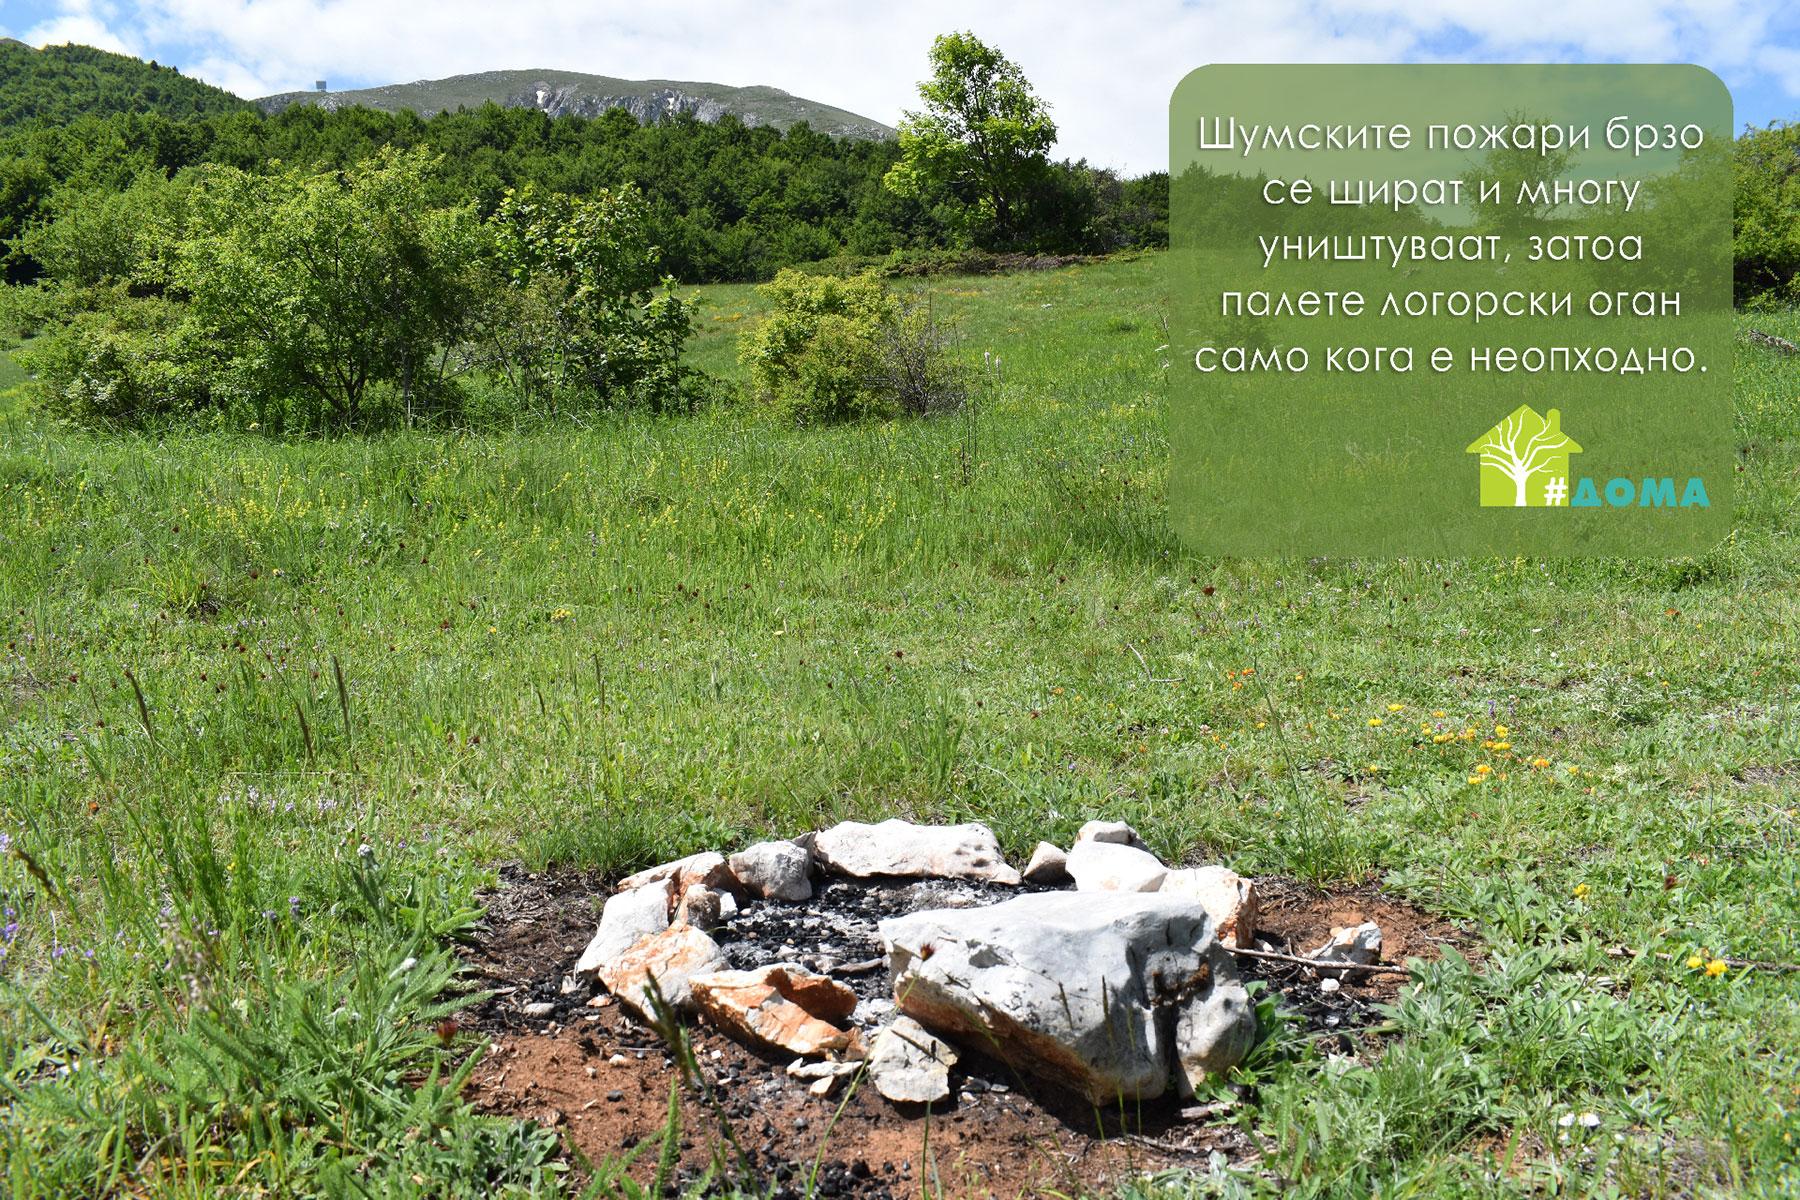 opasnosti od logorski ogan